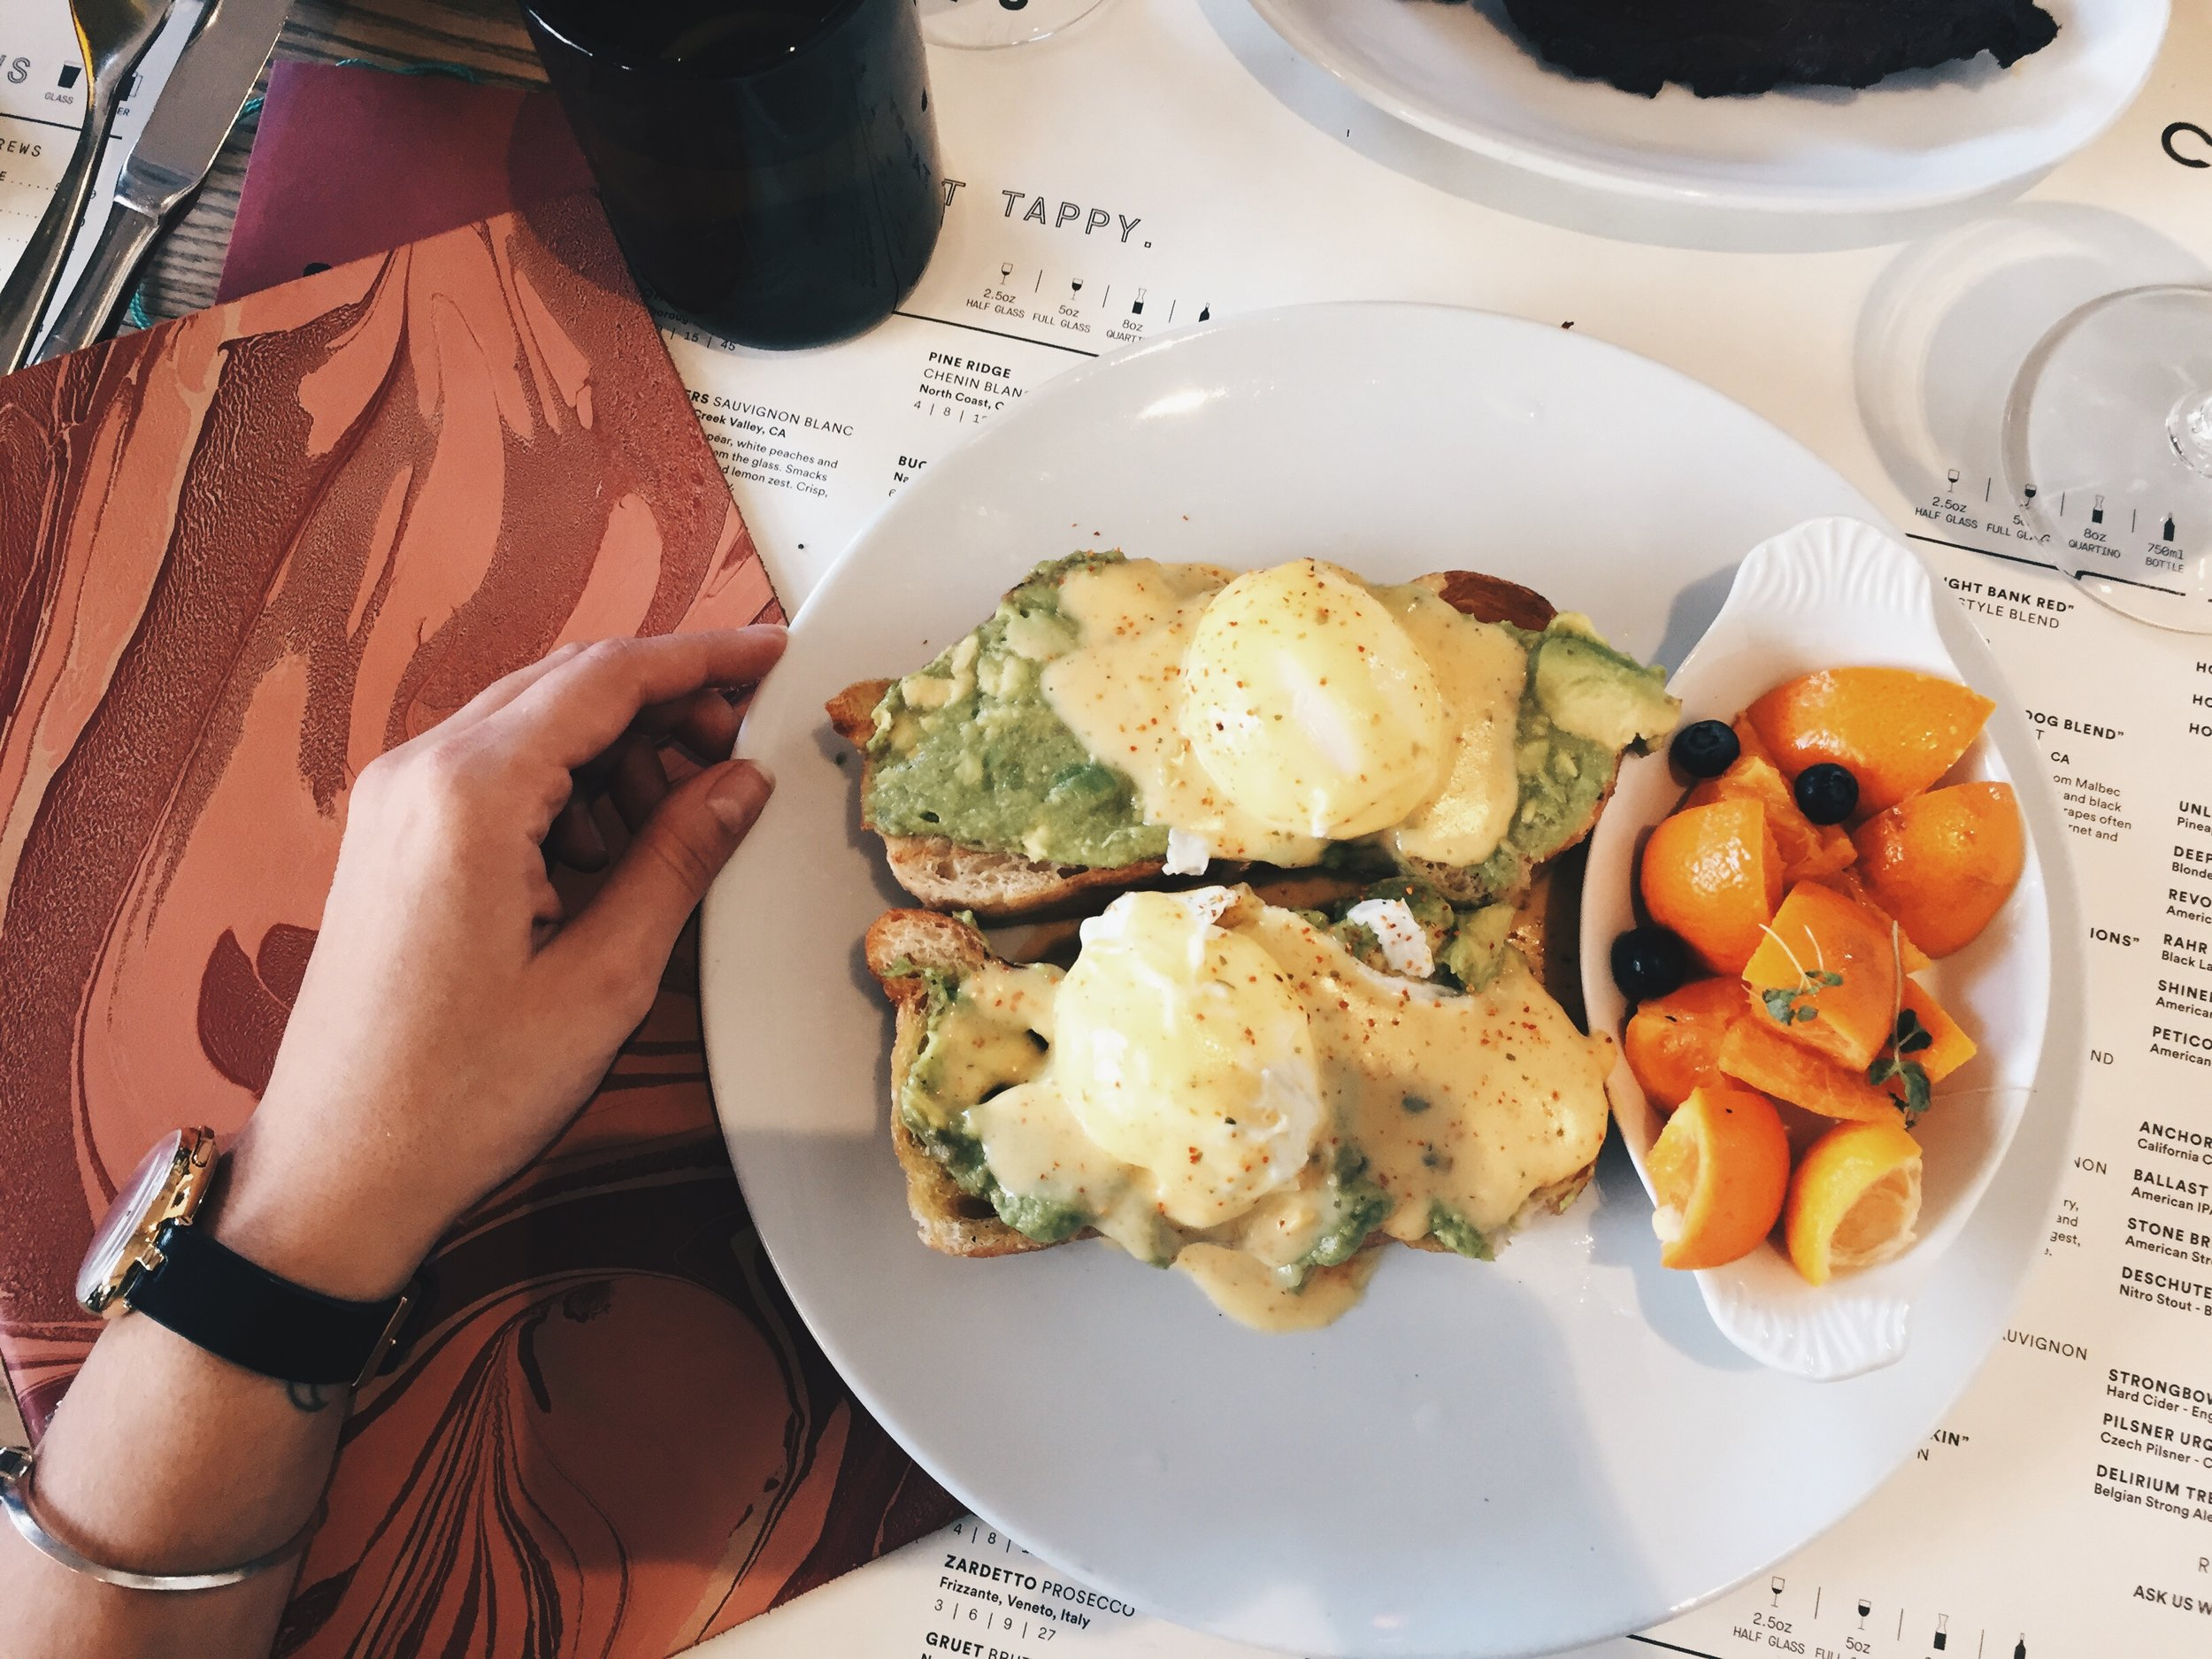 Avocado Eggs Benedict - toasted sea salt ciabatta, avocado smash, free range eggs, togarashi hollandaise and fruit.